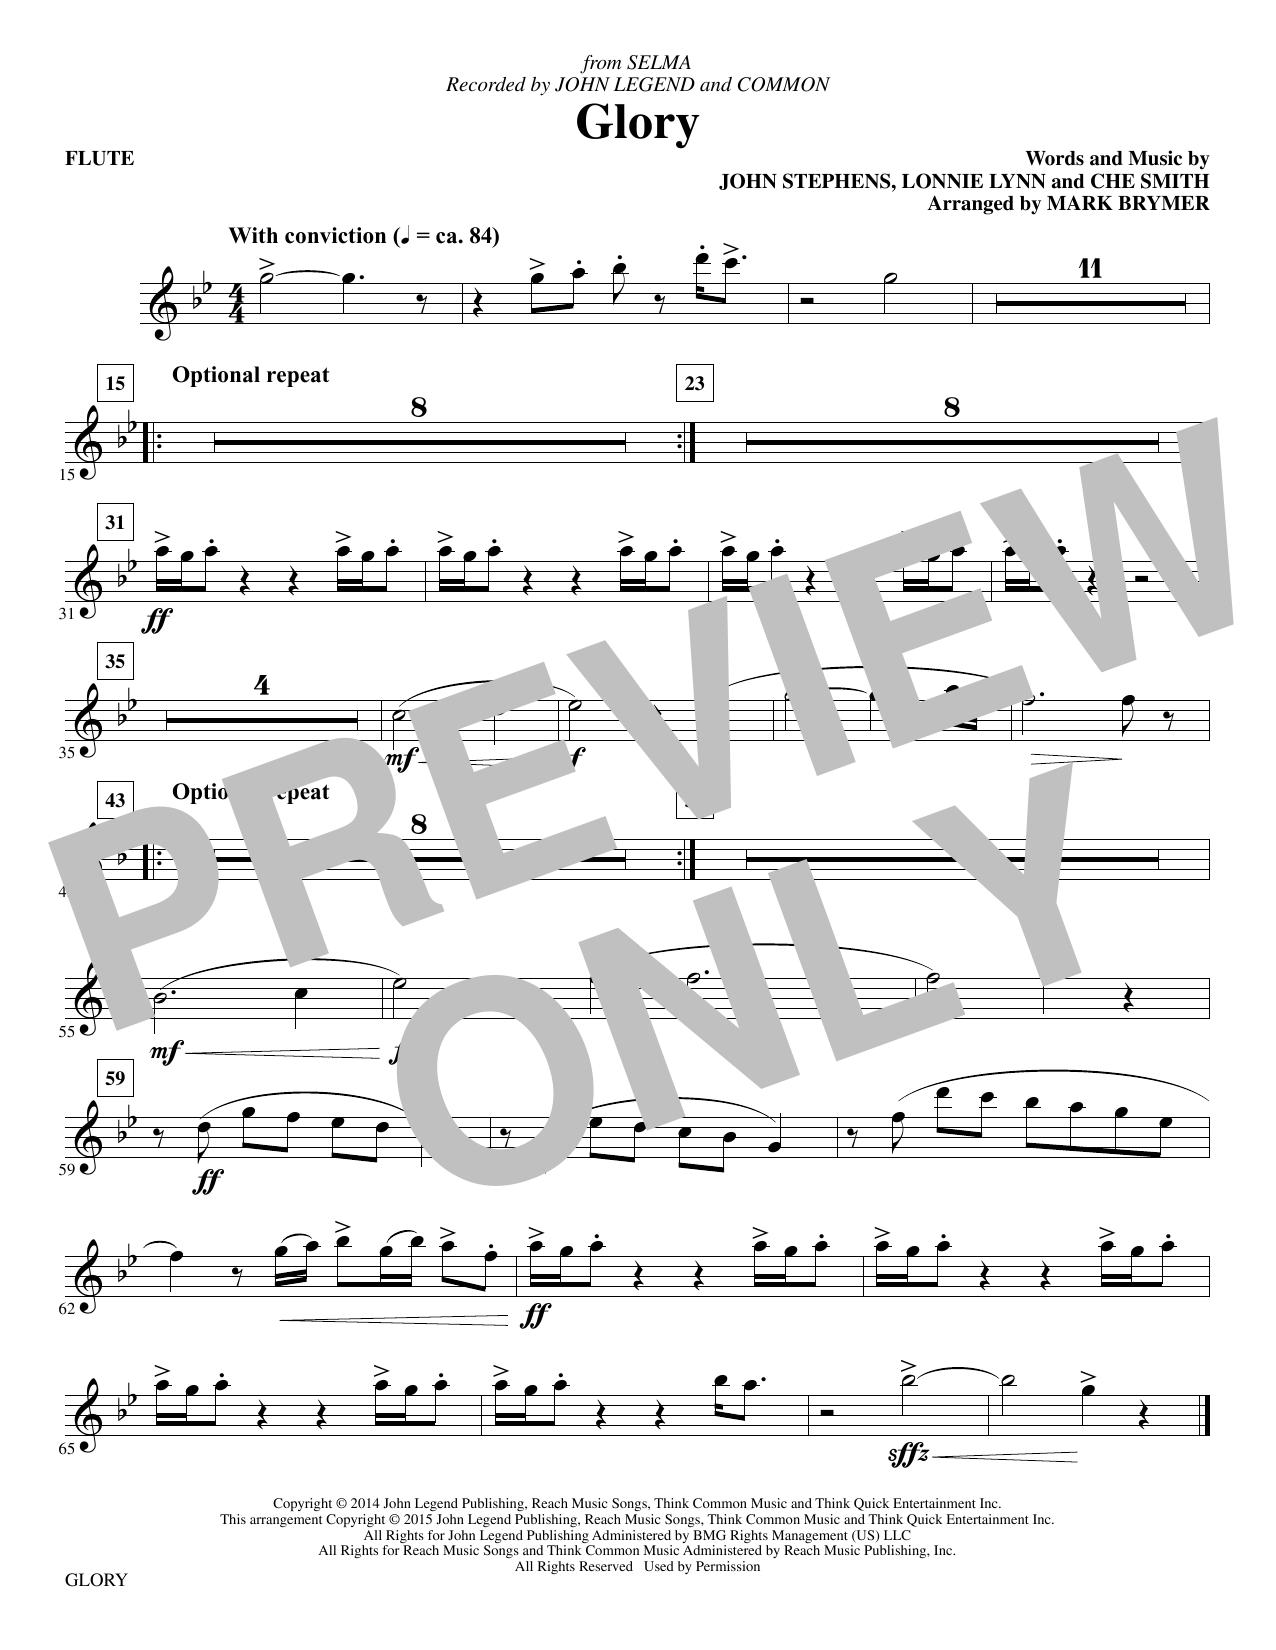 Glory - Flute sheet music